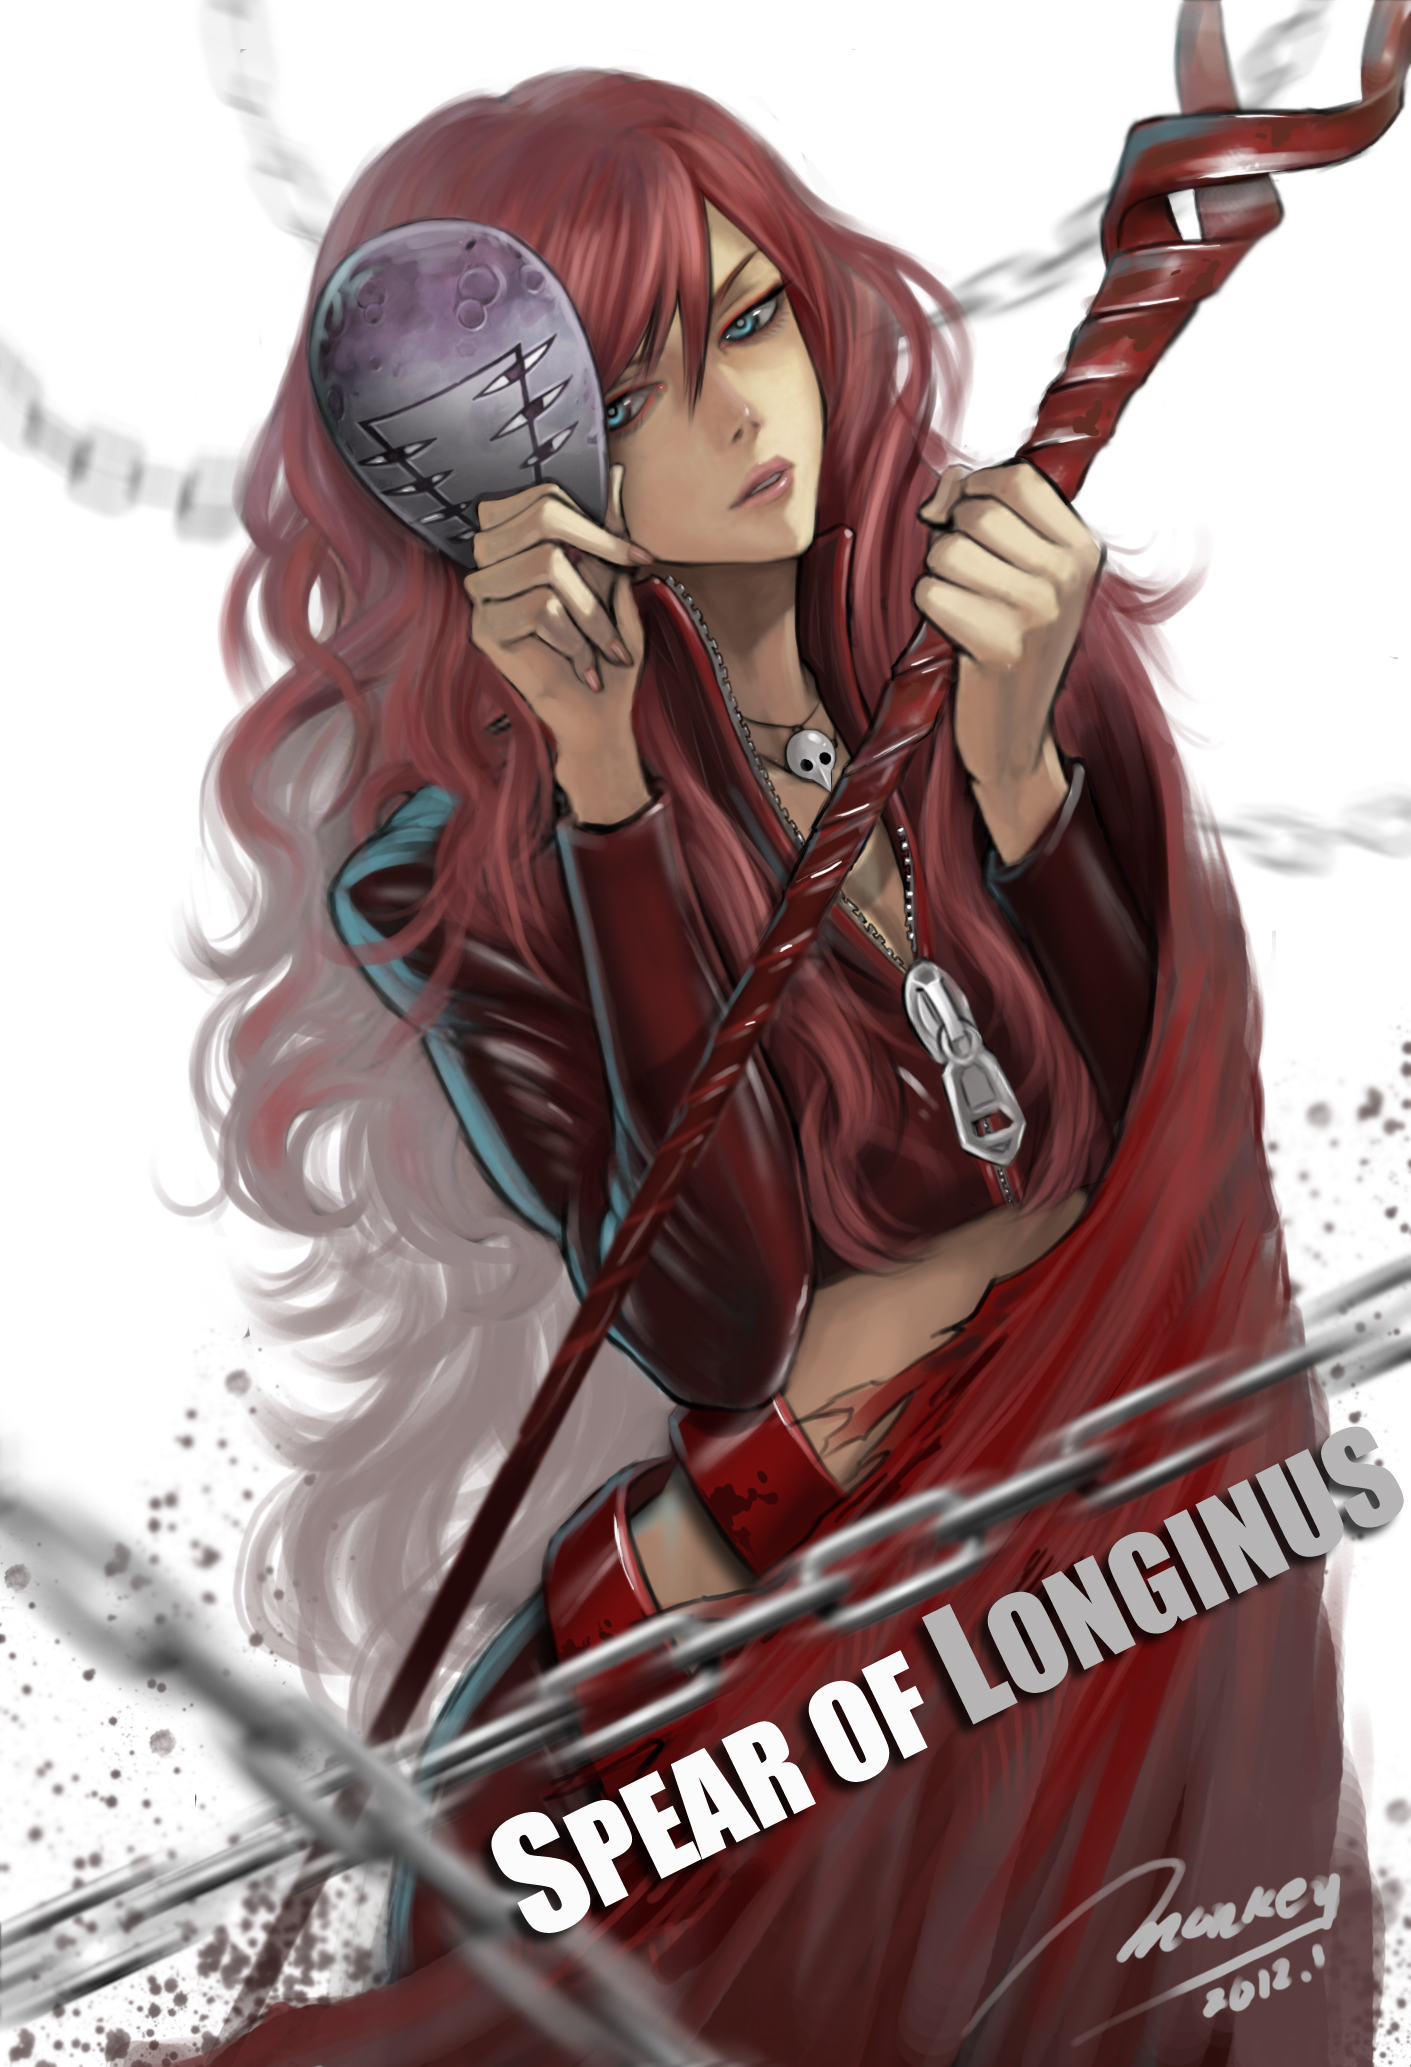 Neon Genesis Evangelion Mobile Wallpaper 974387 Zerochan Anime Image Board